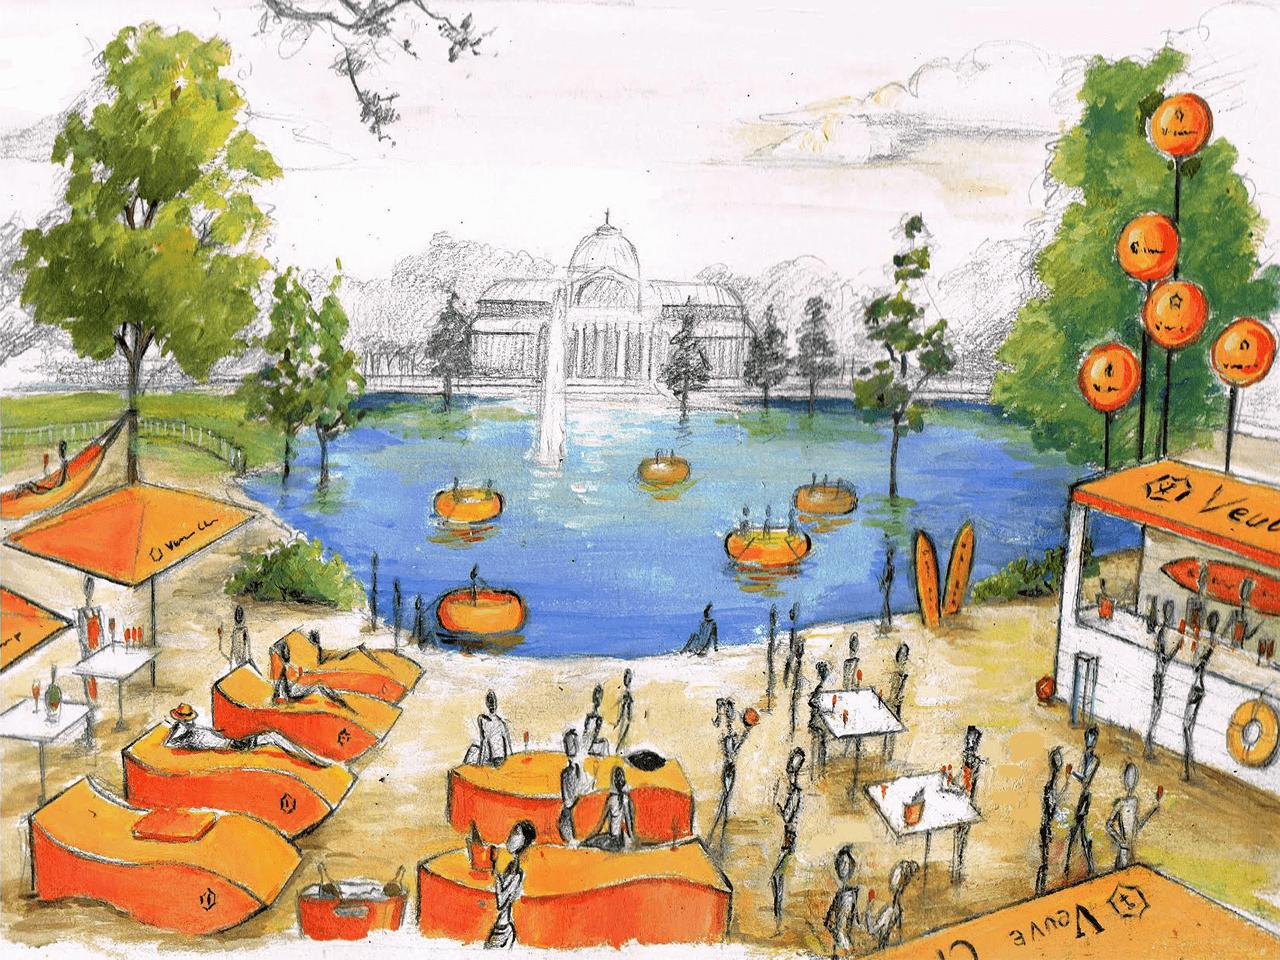 Ilustracion-Veuve-Clicquot-Pintora-Artistica-Carol-Moreno